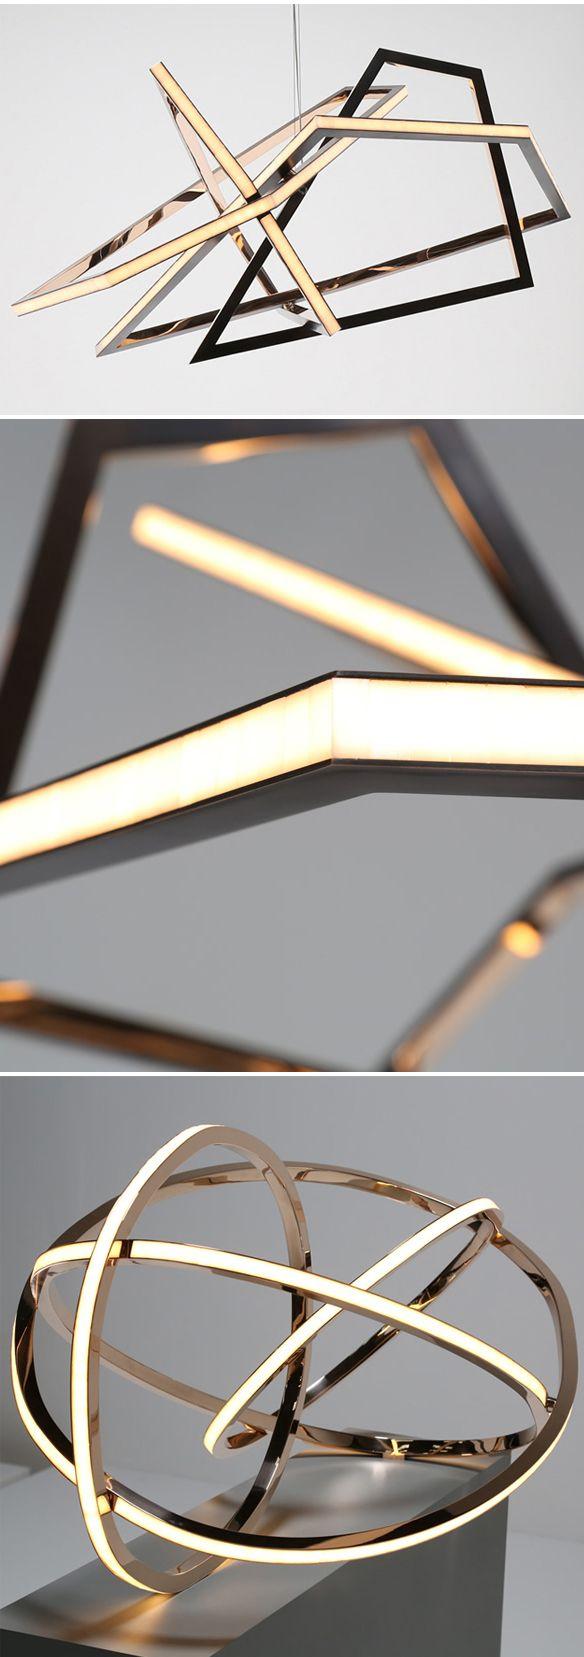 niamh barry (lighting/sculptures!)